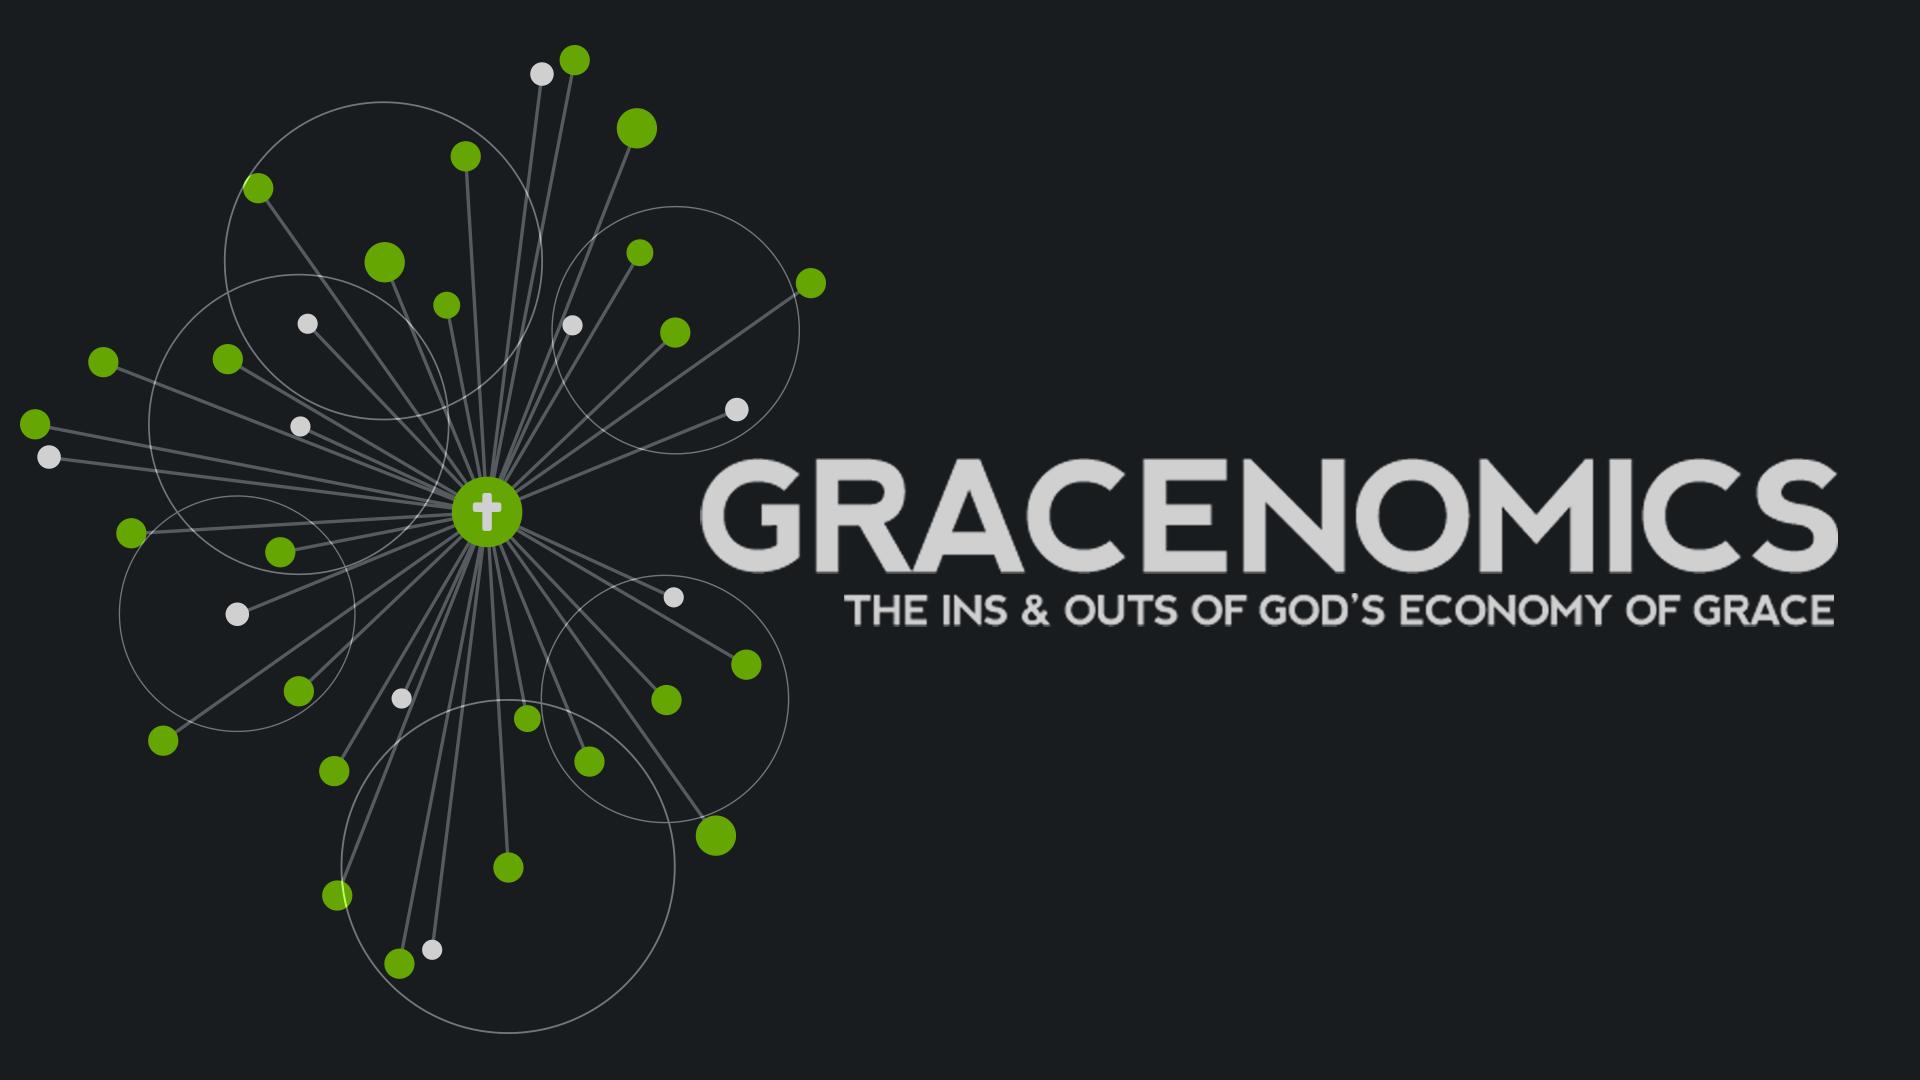 Gracenomics